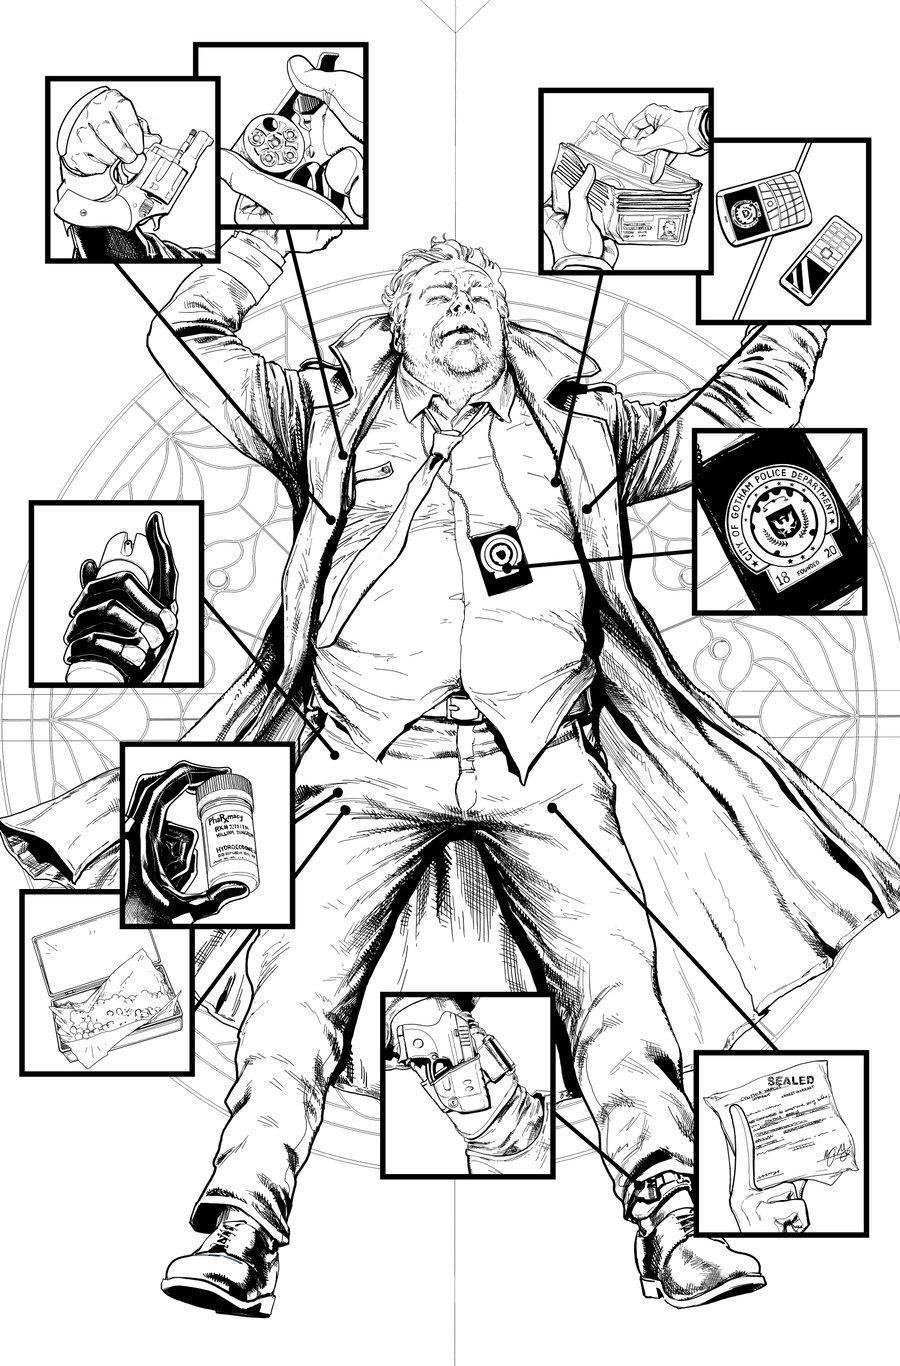 Image of Detective Comics #1027 p.06 ARTIST'S PROOF